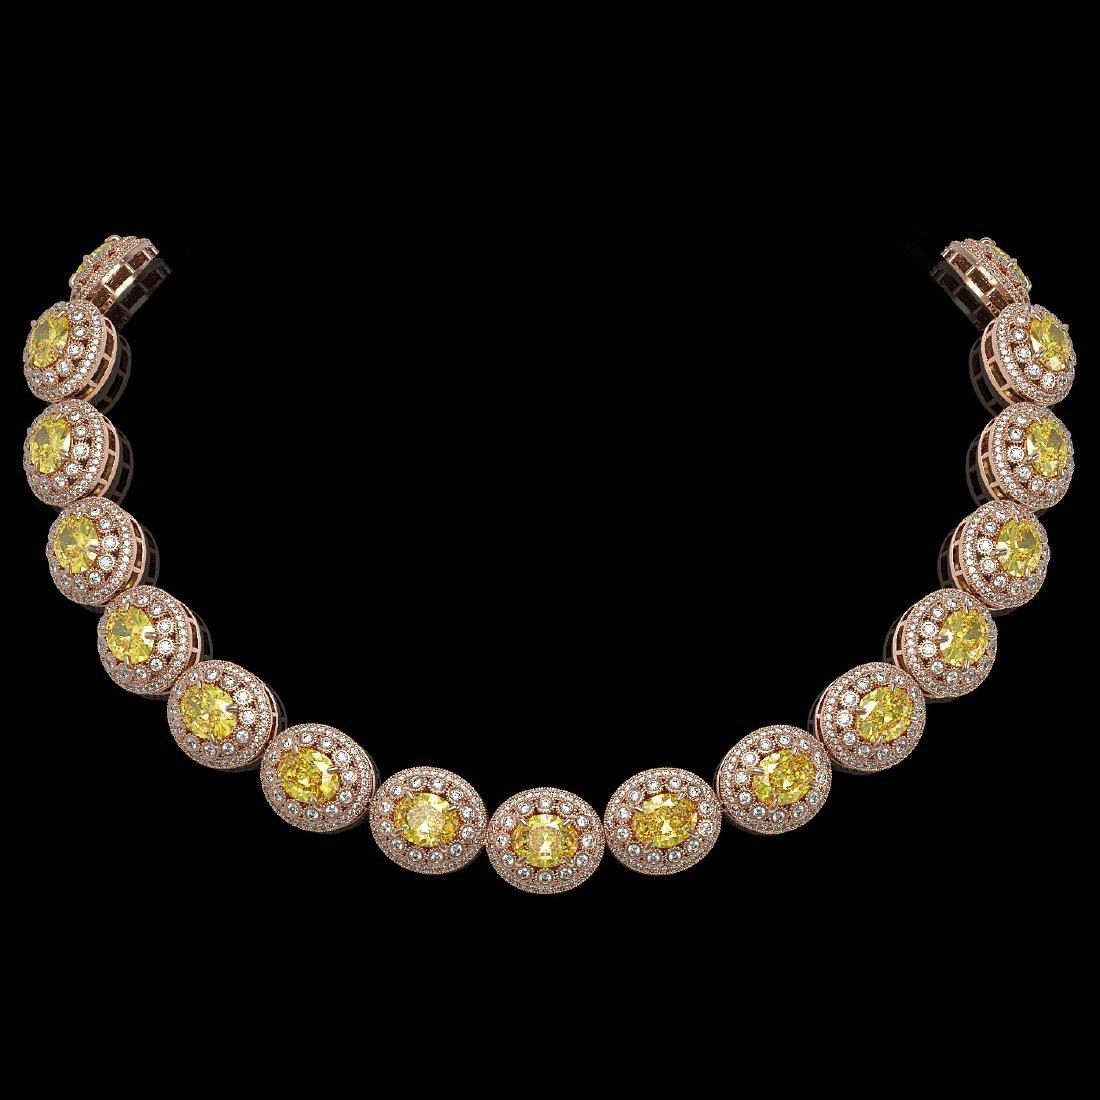 89.35 ctw Canary Citrine & Diamond Necklace 14K Rose